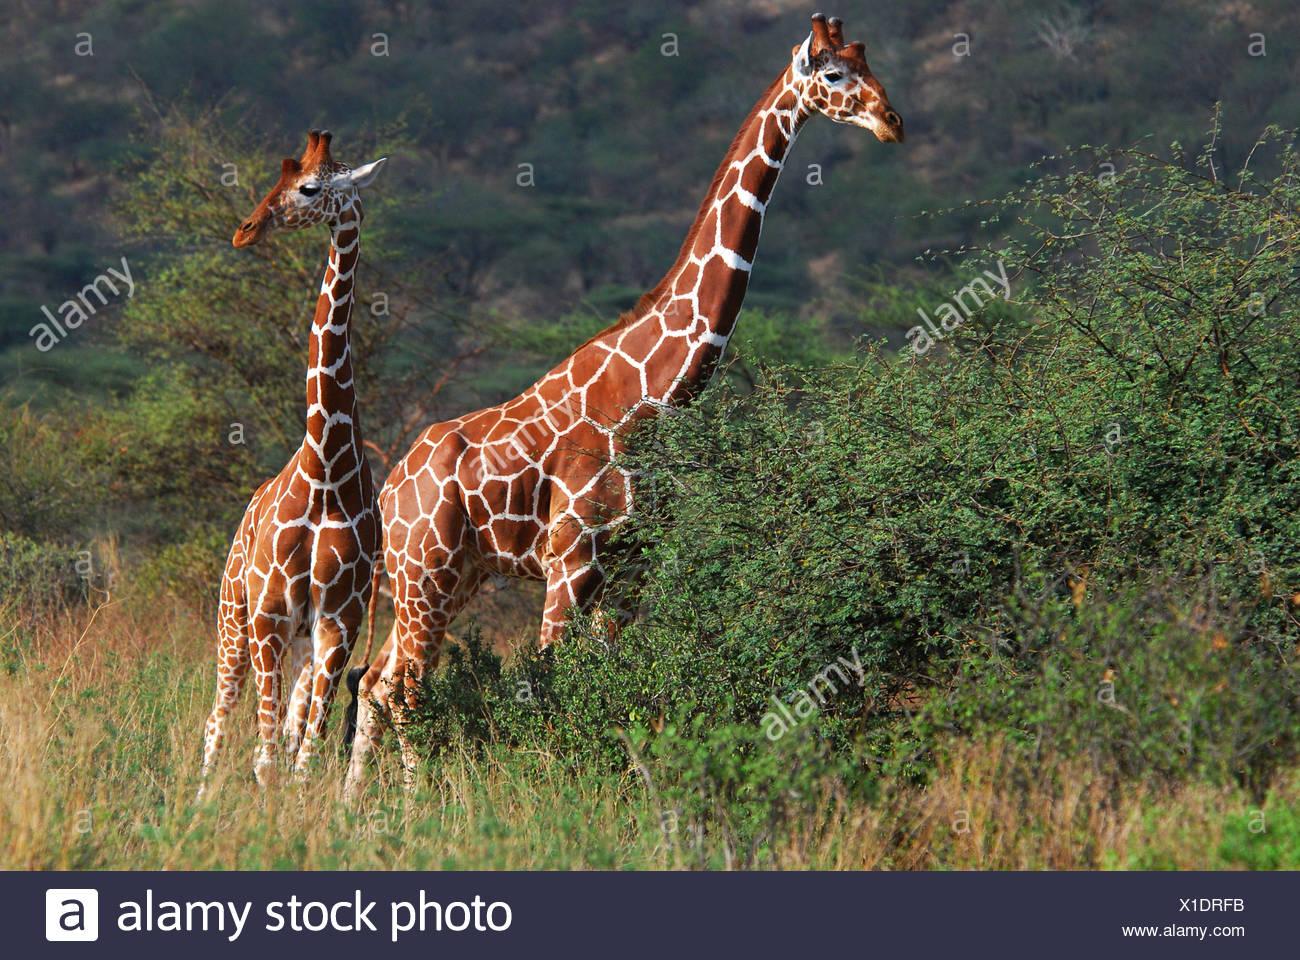 Somalische Giraffe (Giraffa Plancius Reticulata) Samburu Nationalpark, Kenia, Afrika Stockfoto